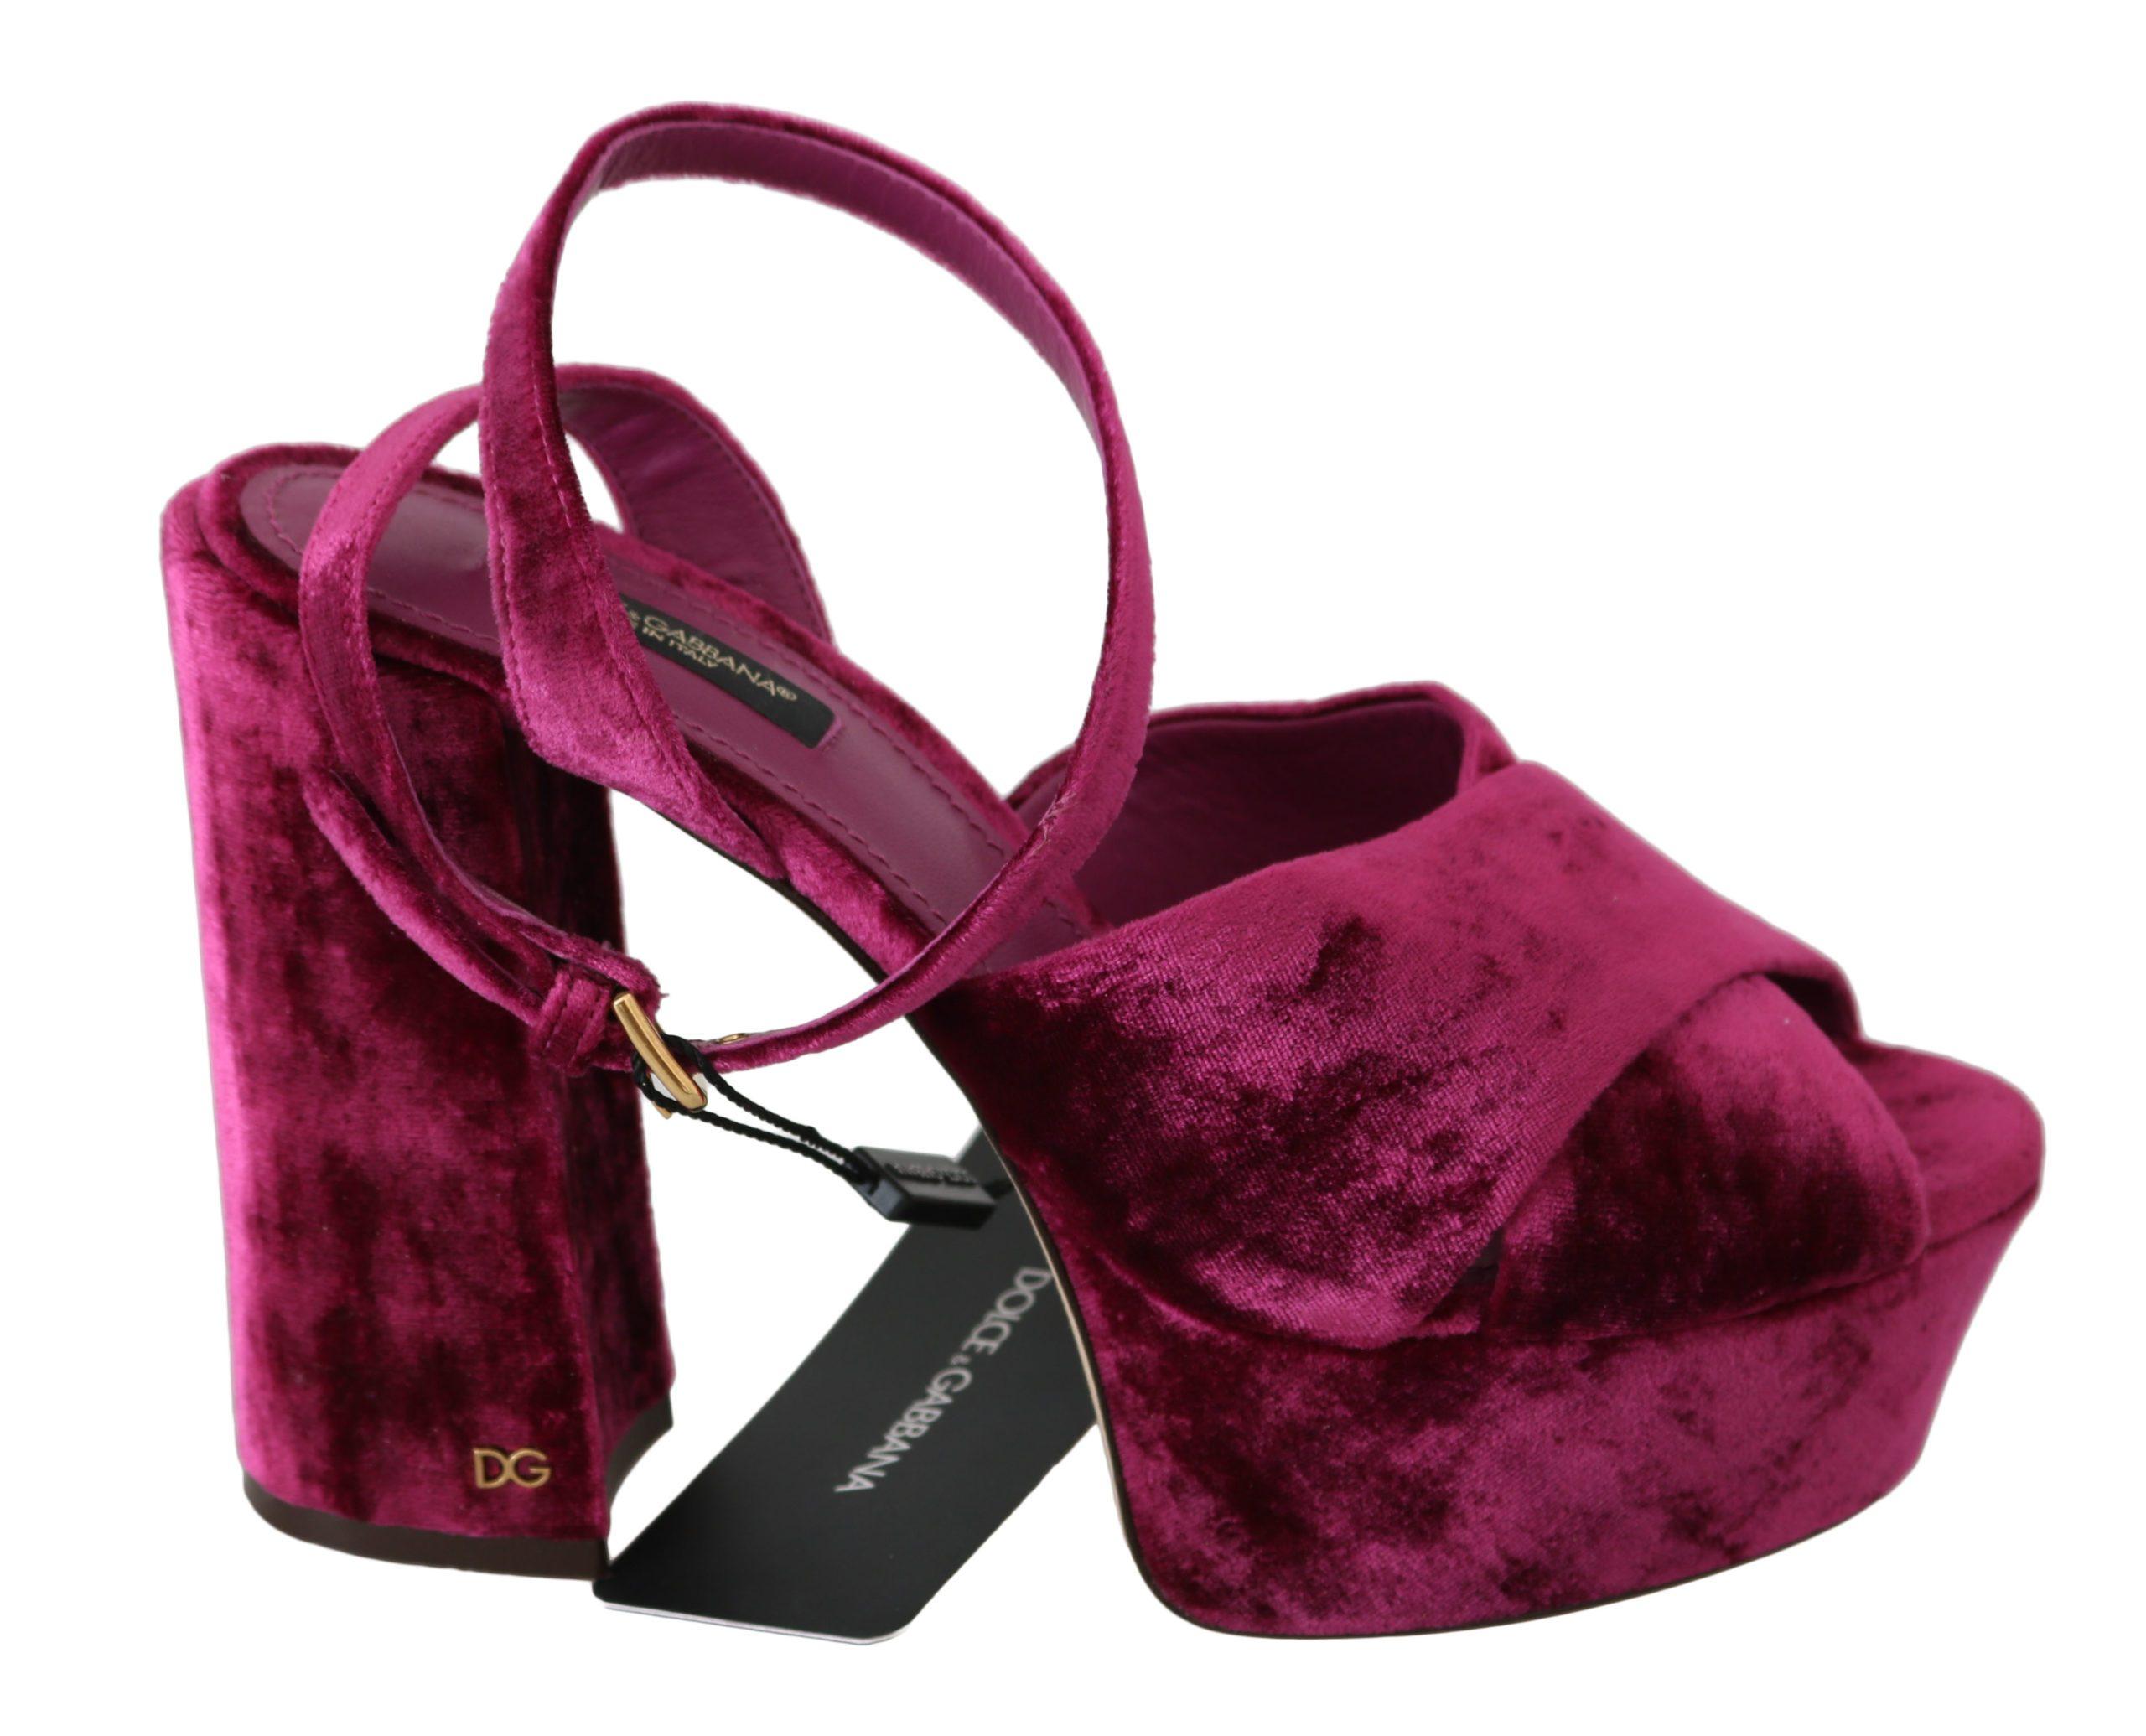 Dolce & Gabbana Women's Strap Sandals Purple LA6263 - EU35/US4.5